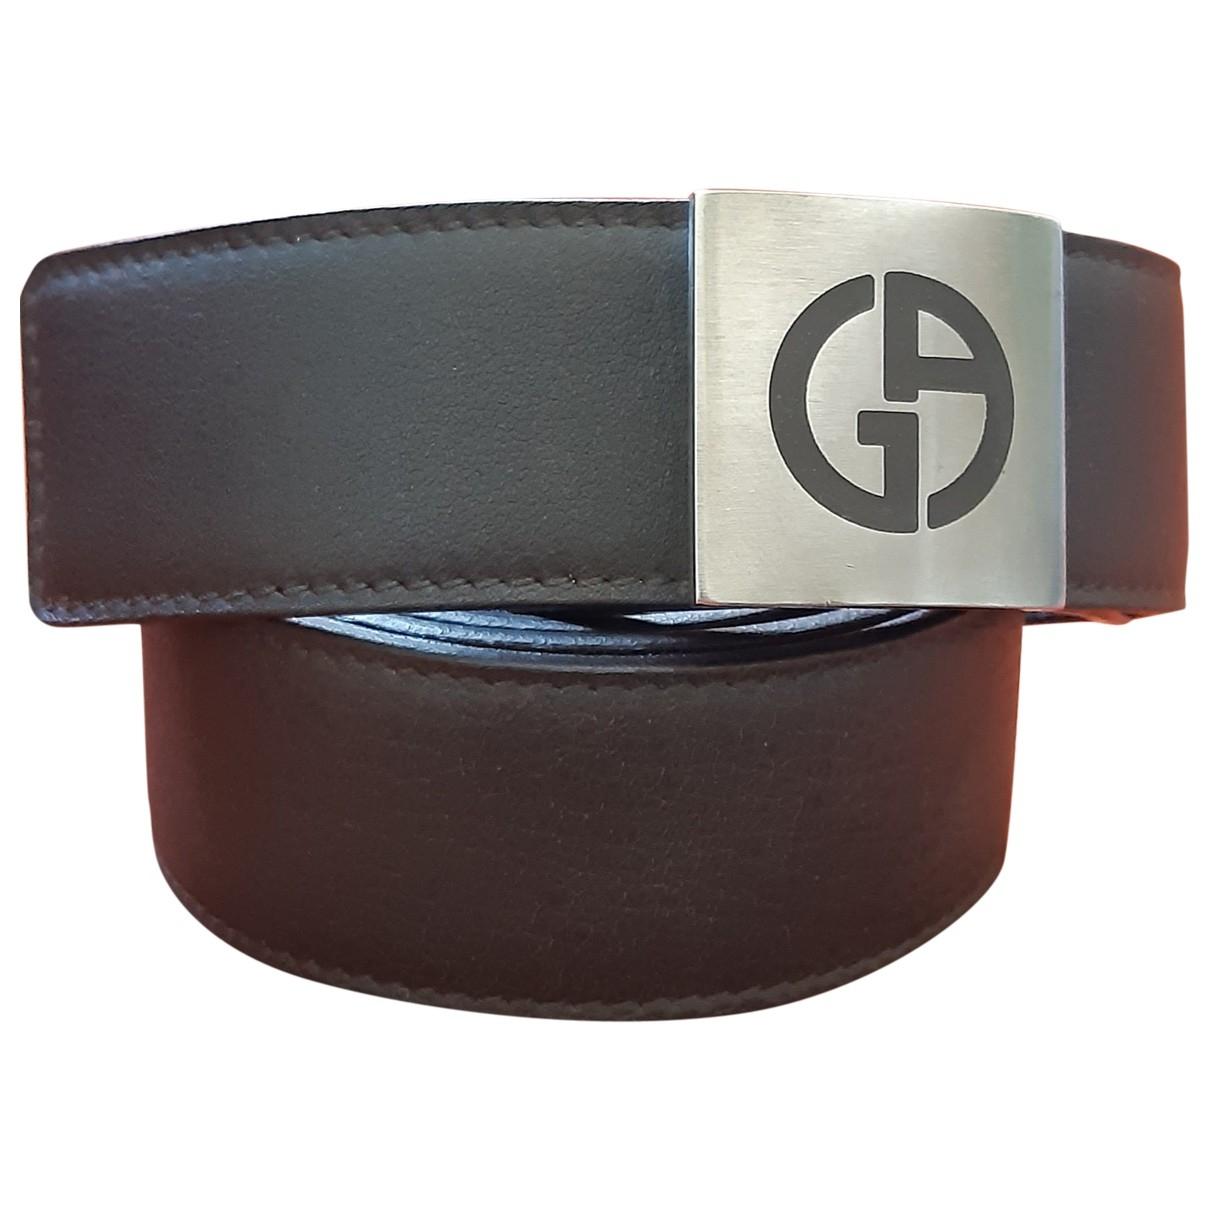 Cinturon de Cuero Giorgio Armani